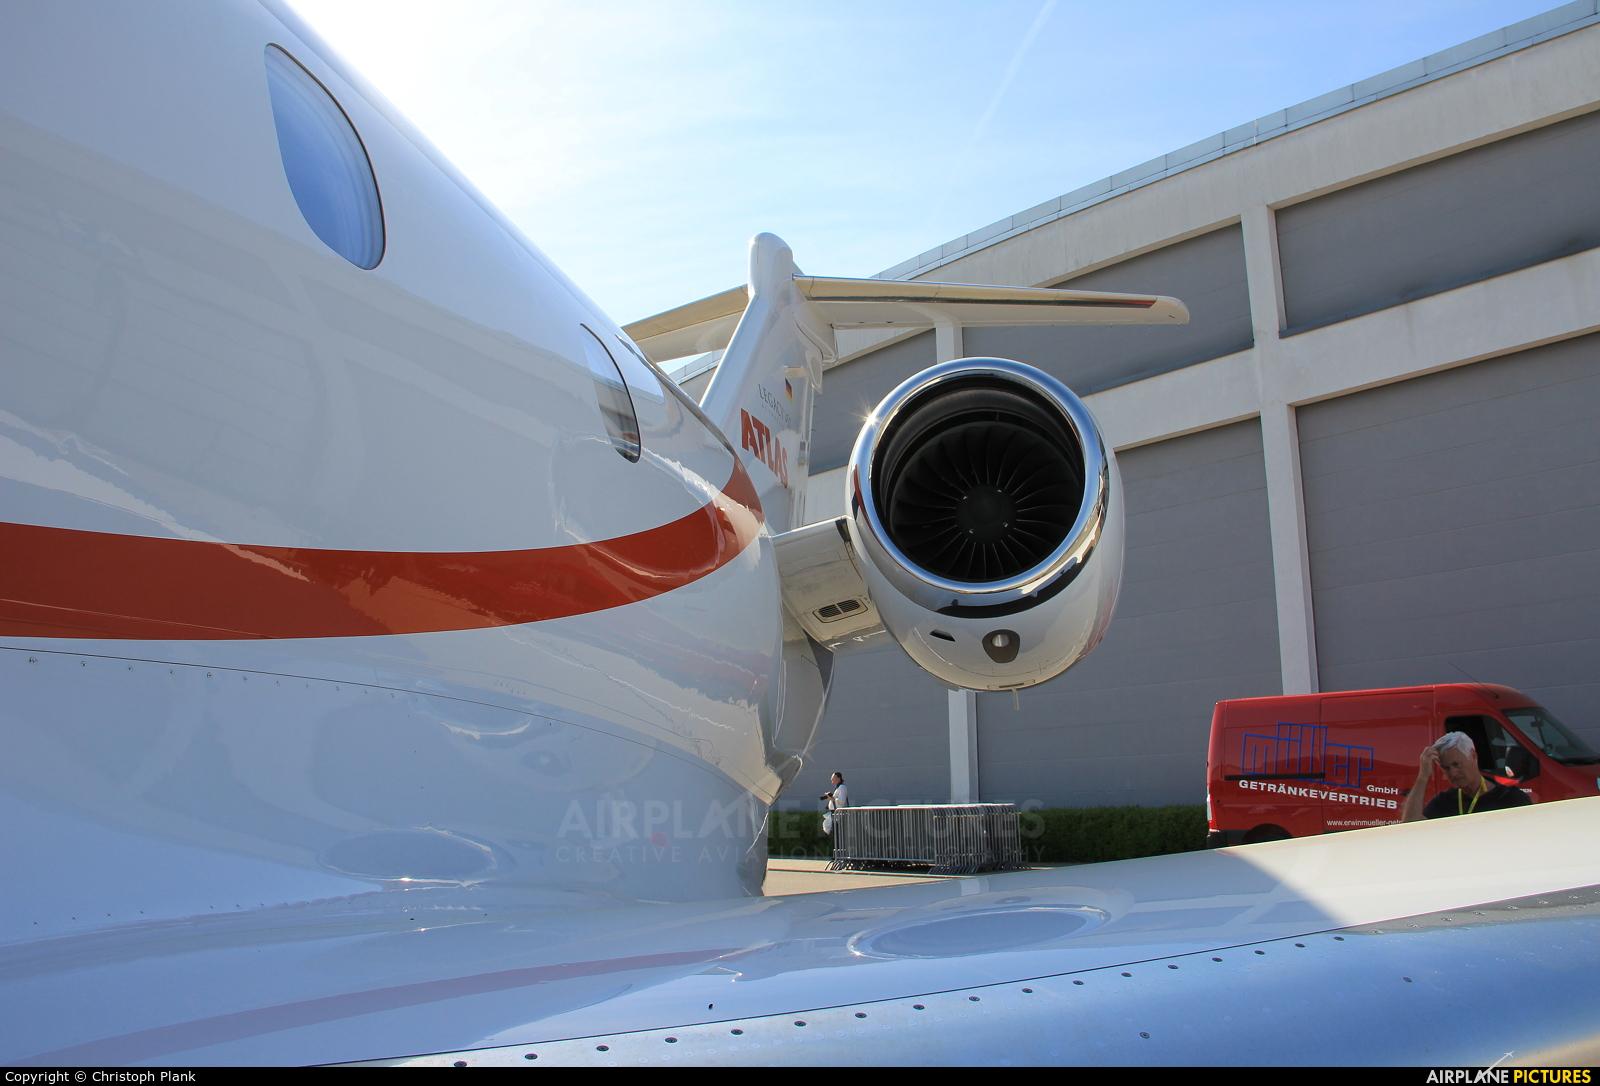 Atlas Air D-BFIL aircraft at Friedrichshafen